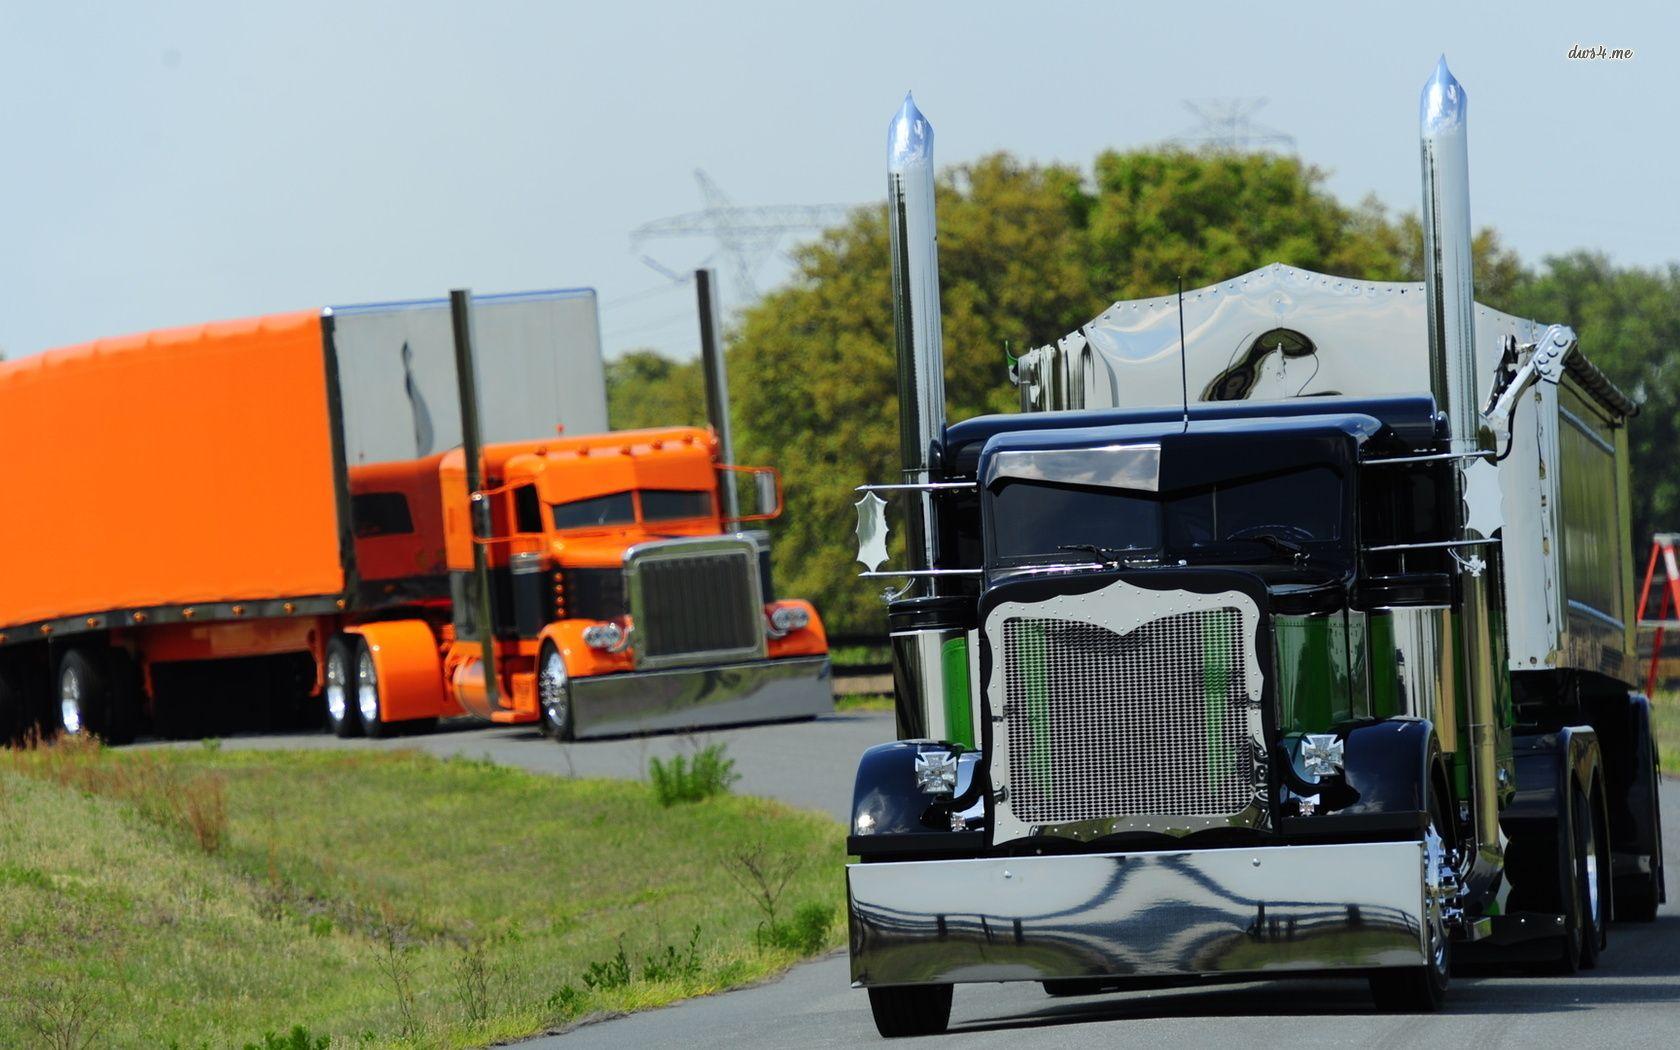 Peterbilt Trucks Hd Wallpaper With Images Peterbilt Trucks